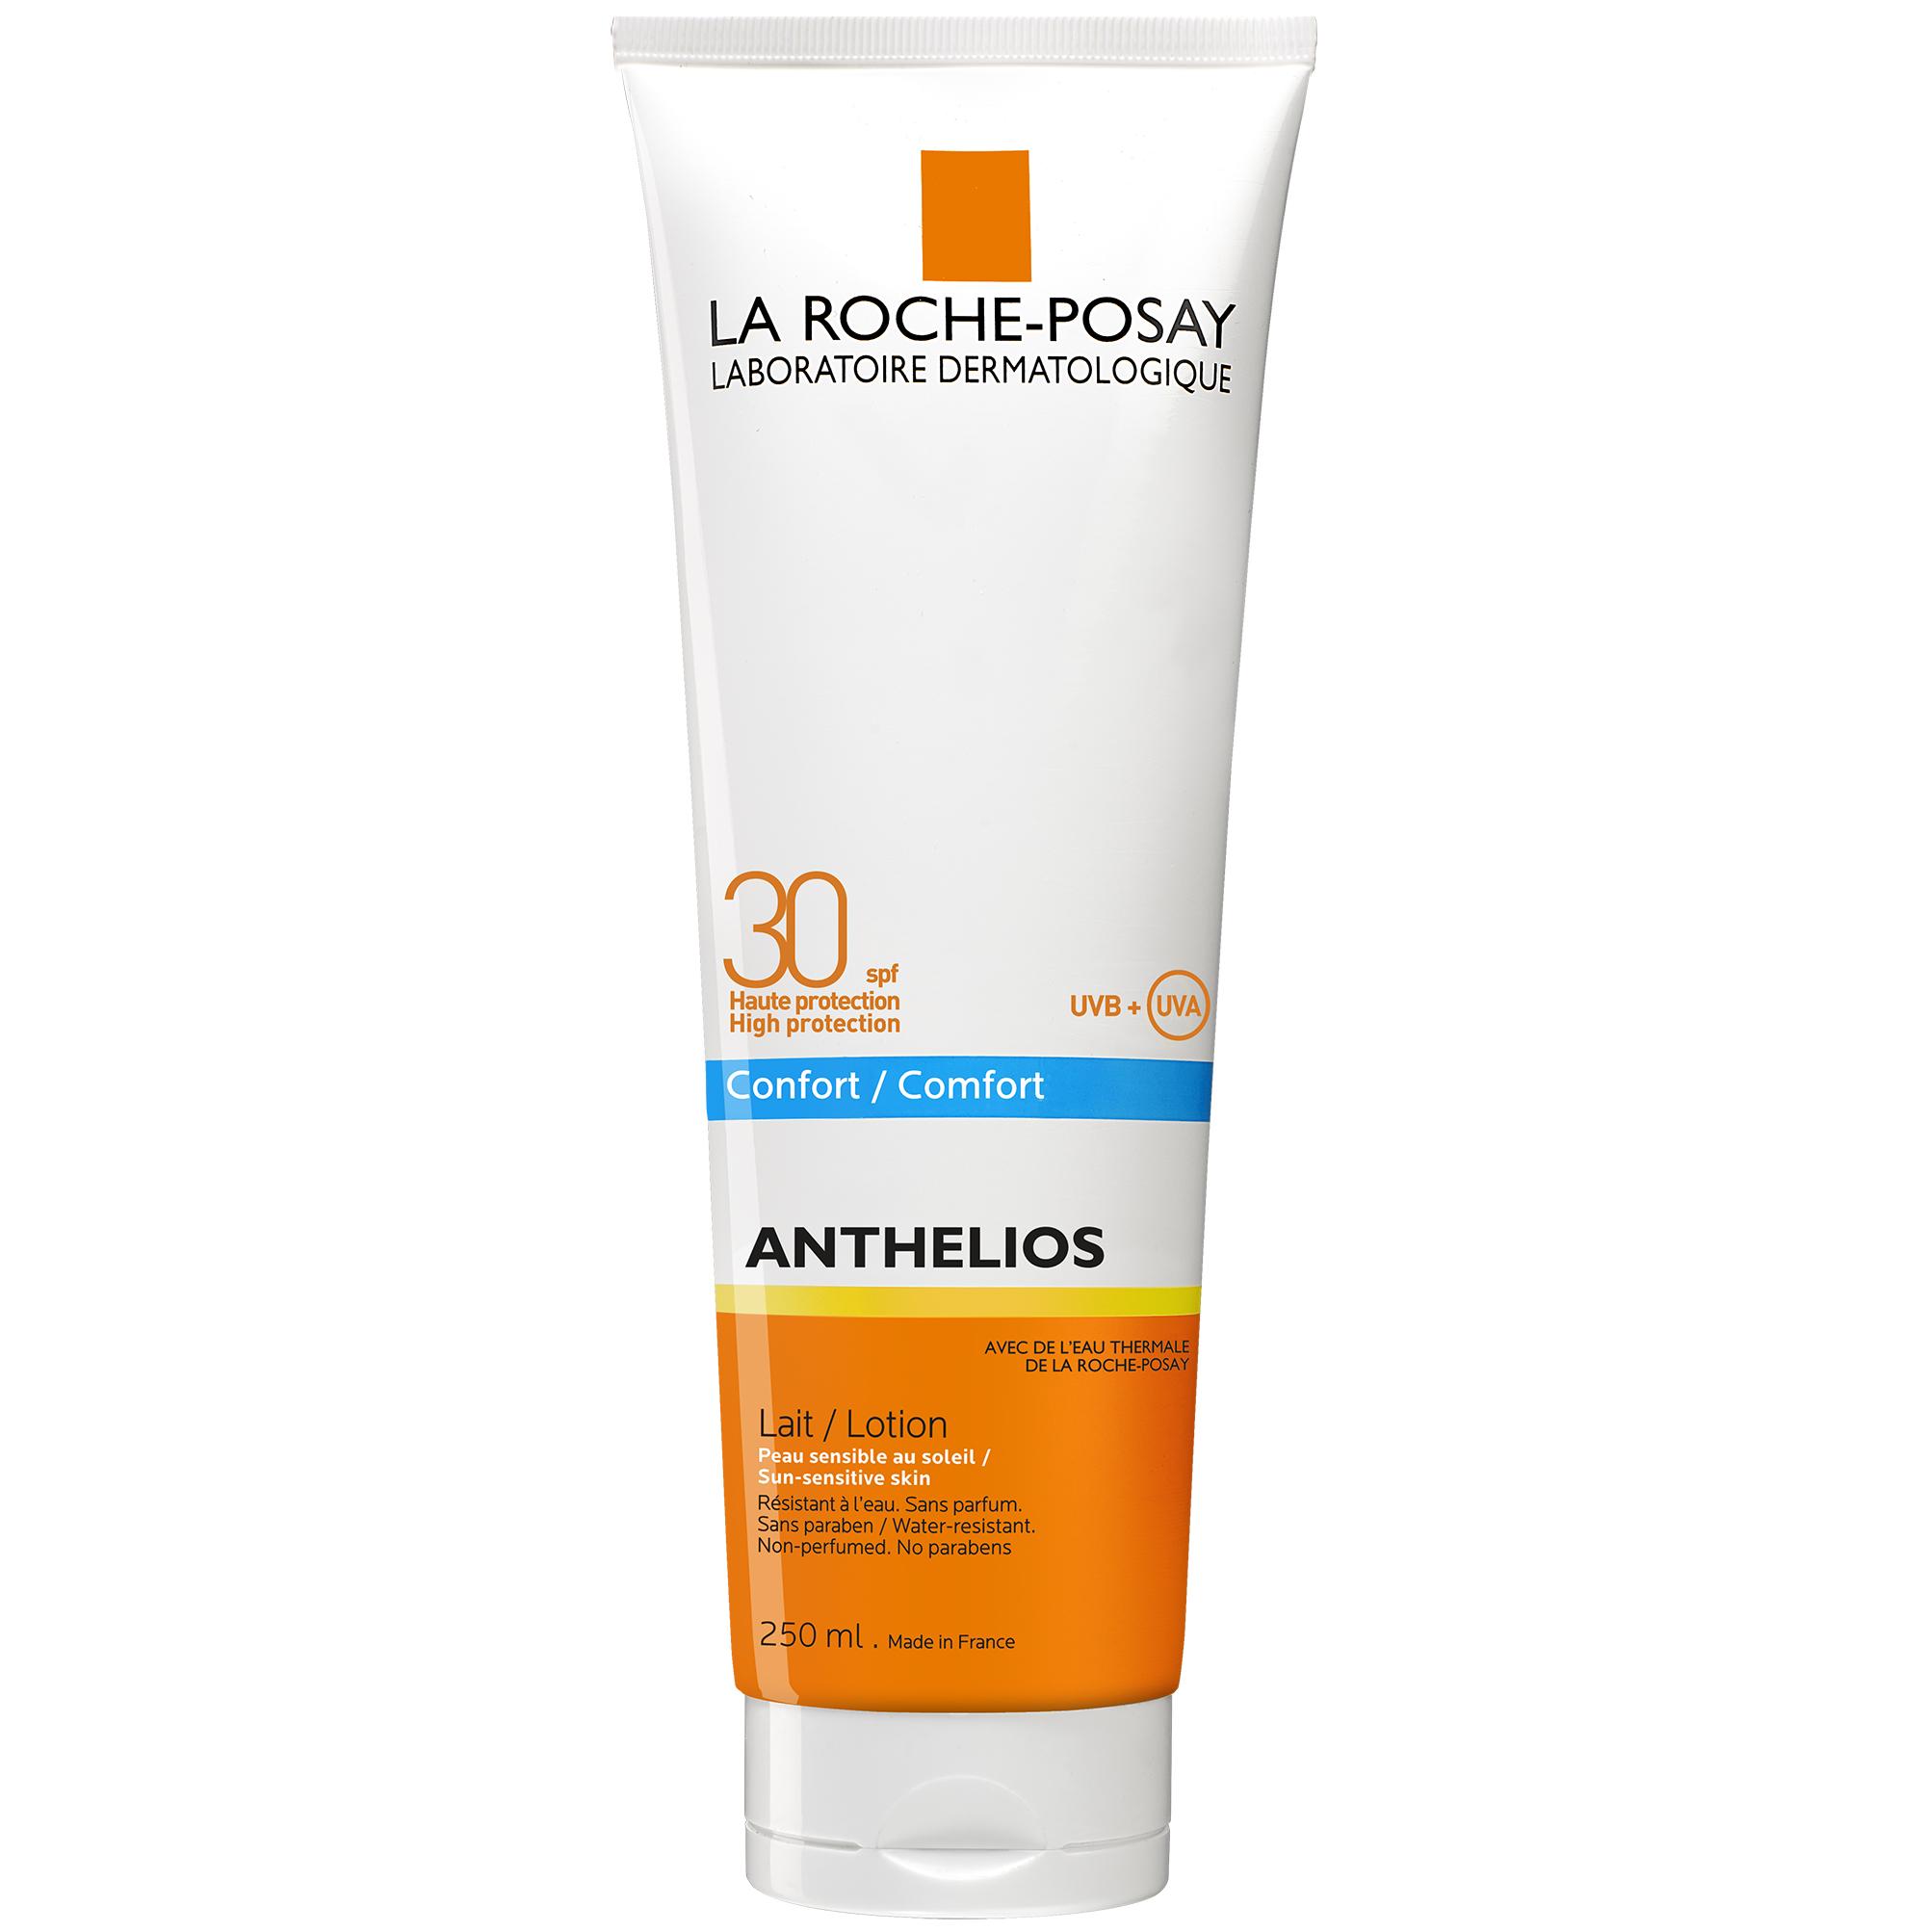 La Roche-Posay Special Pack AntheliosComfortSpf30 Αντηλιακό Γαλάκτωμα Σώματος Χωρίς Άρωμα 250ml